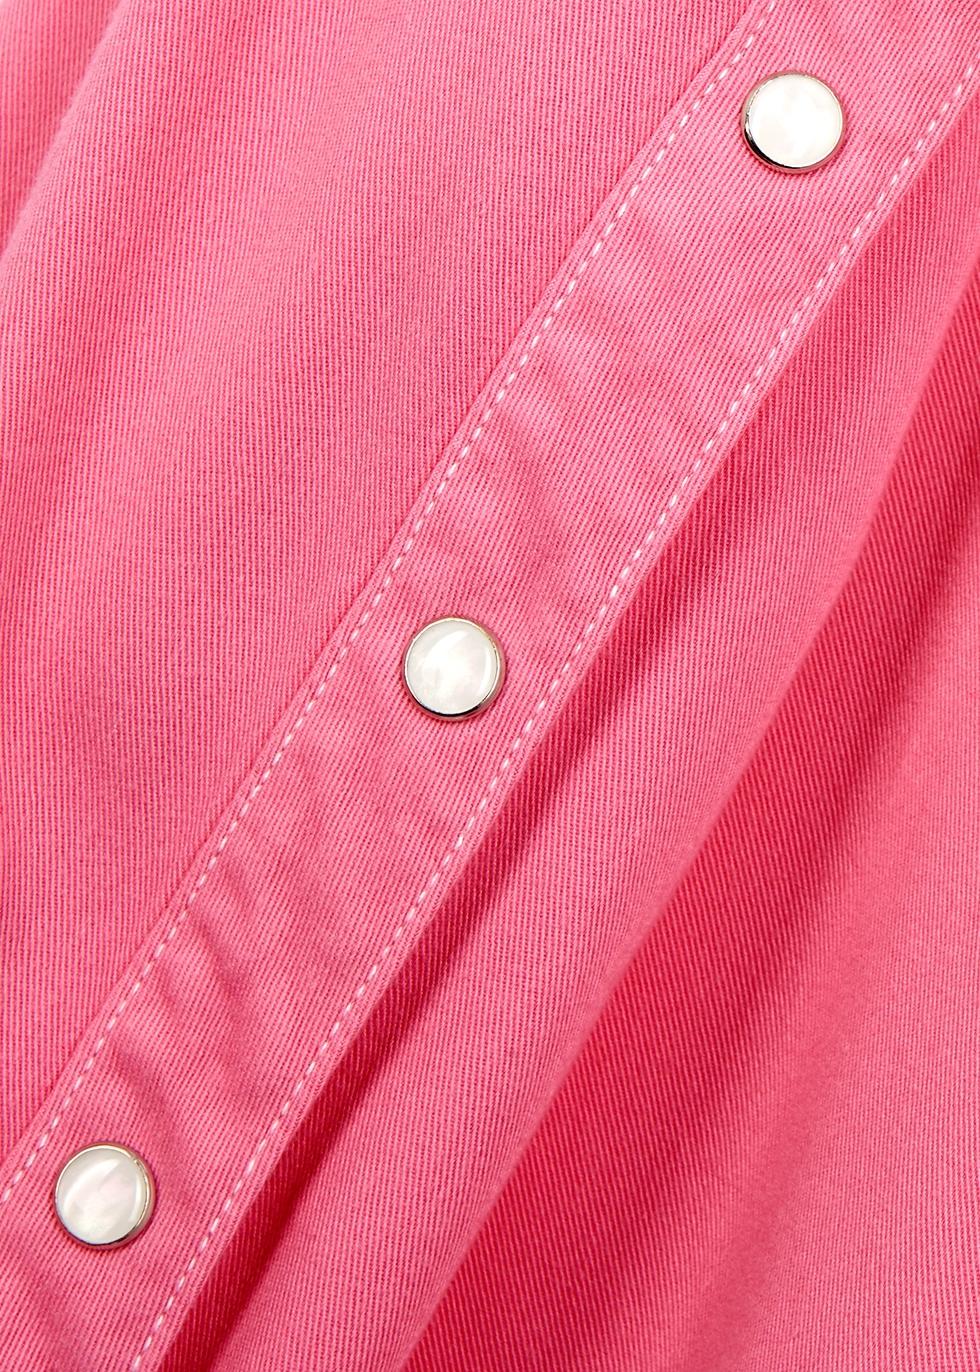 Pink rayon-blend twill shirt - SJYP